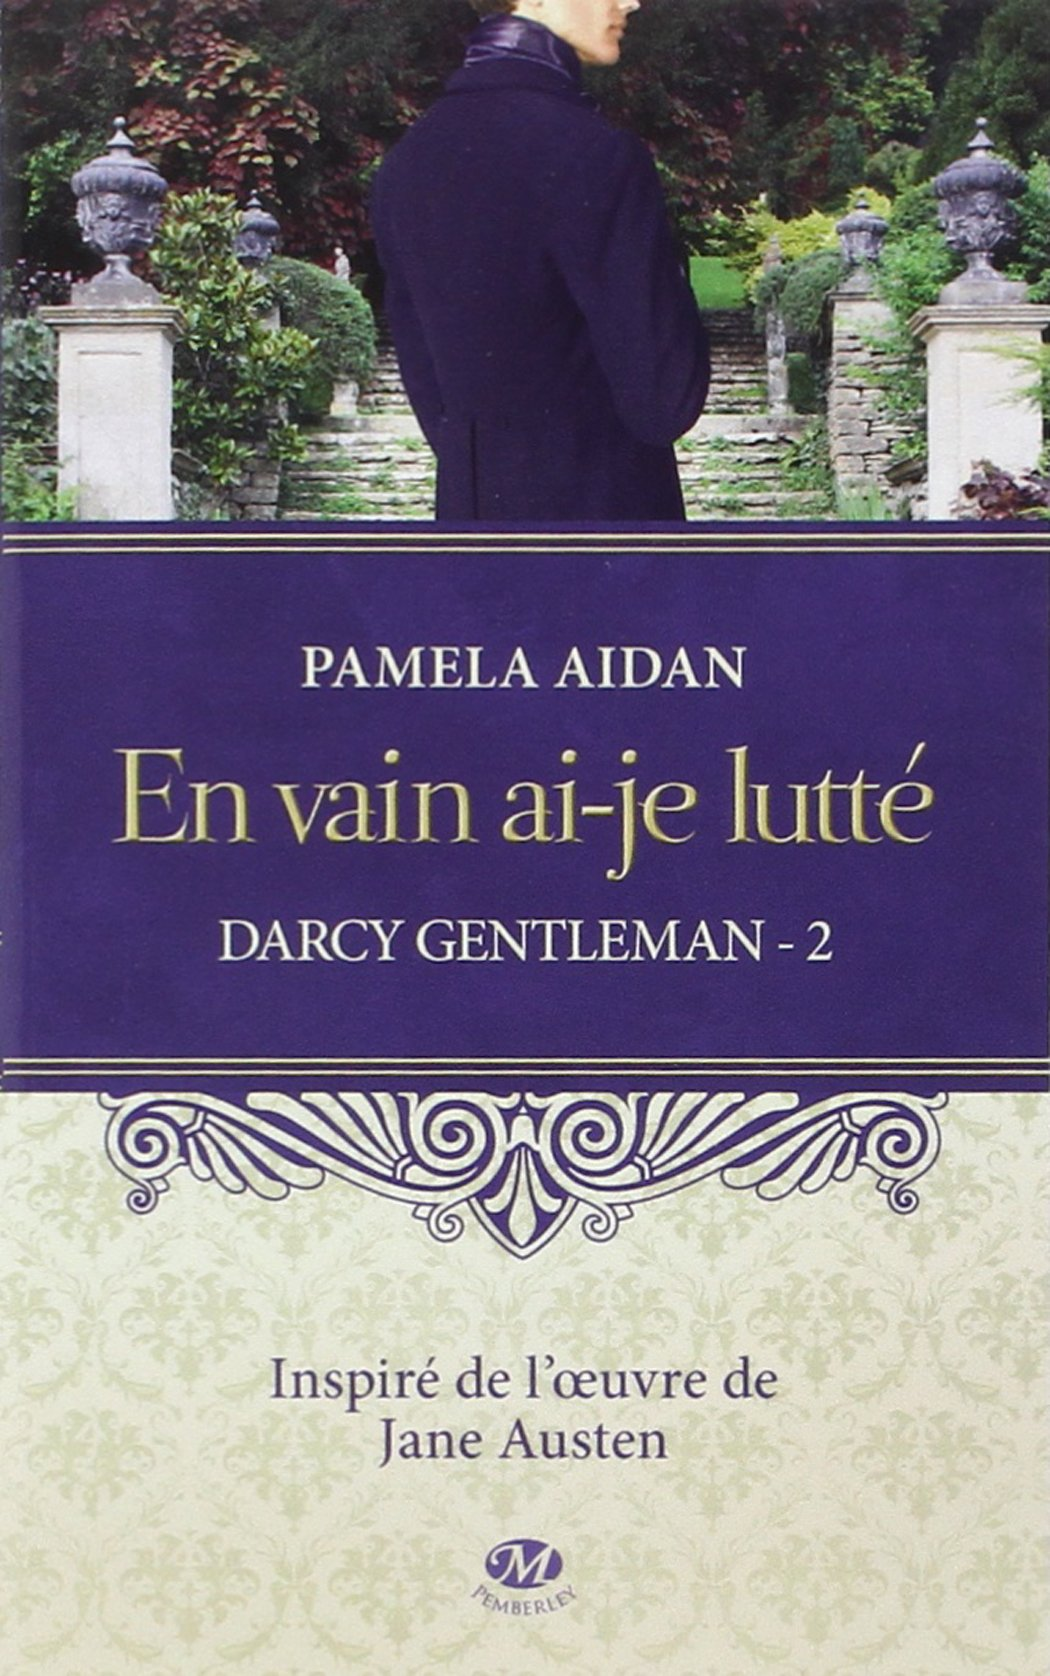 Trilogie Darcy Gentleman - Pamela Aidan (3 Tomes) 81snhBOS-WL